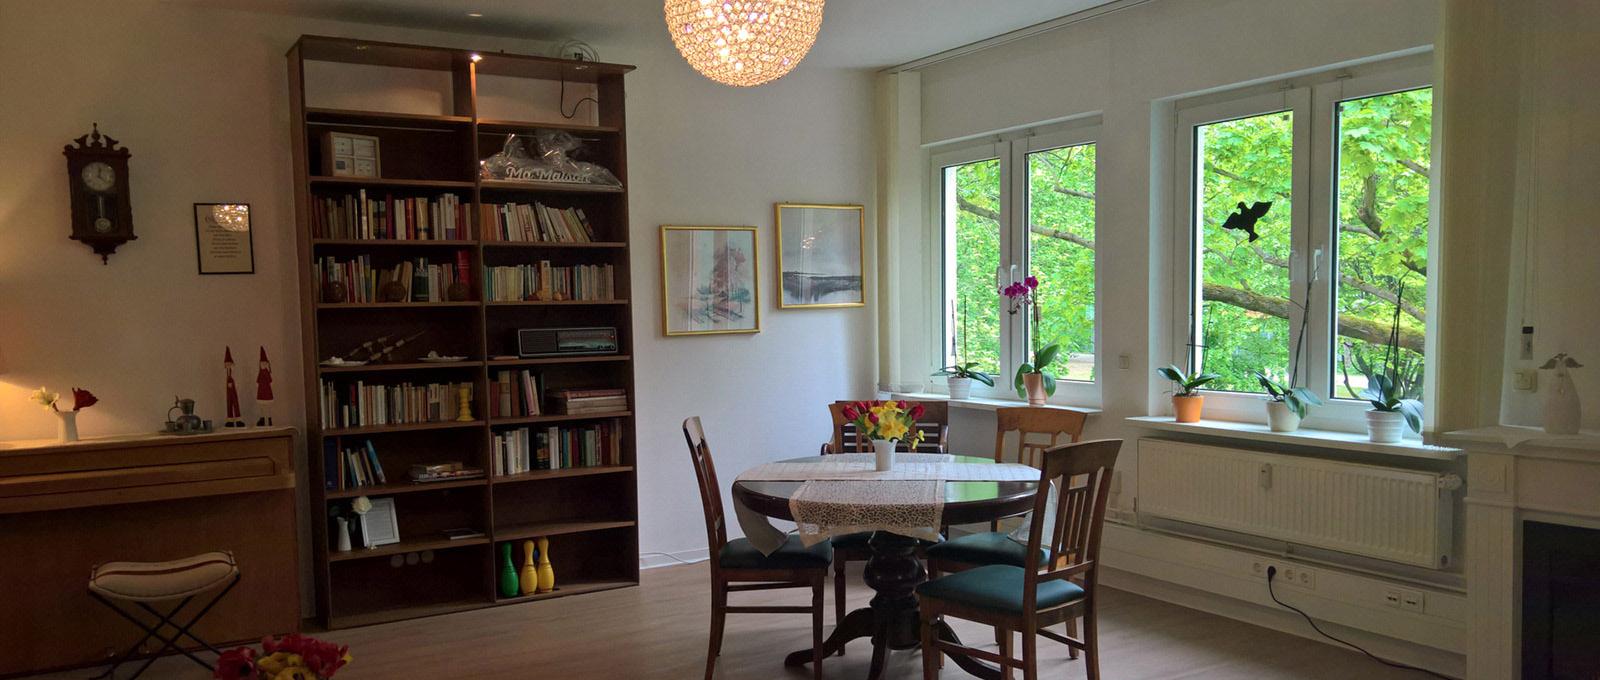 Ma Maison Tagespflege Berlin